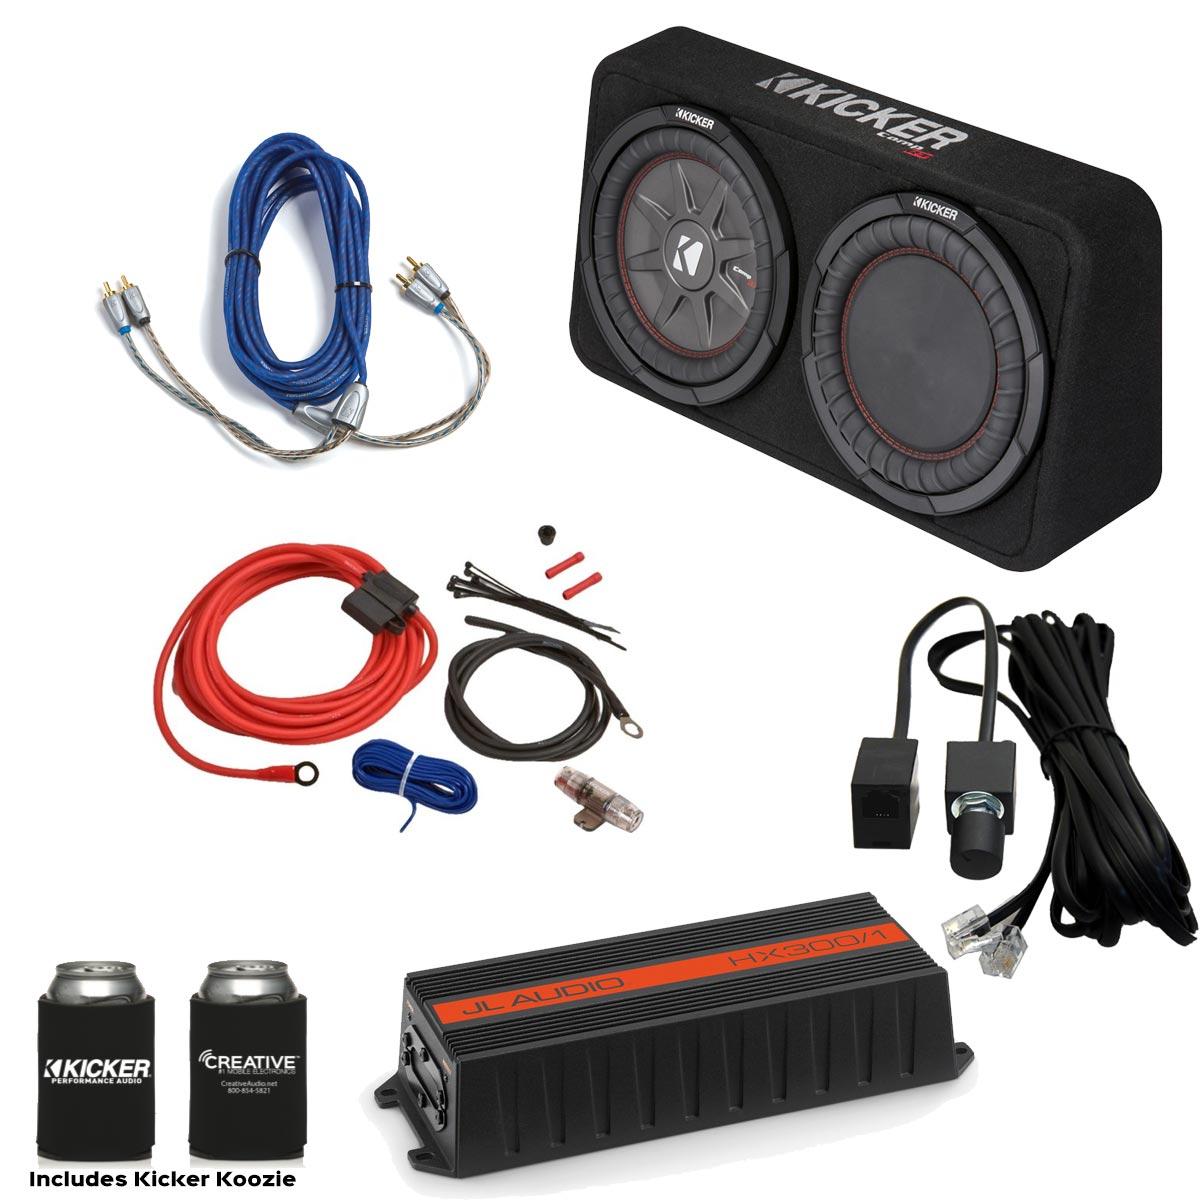 kicker amp wiring jl audio hx300/1 300 watt amp, kicker 10